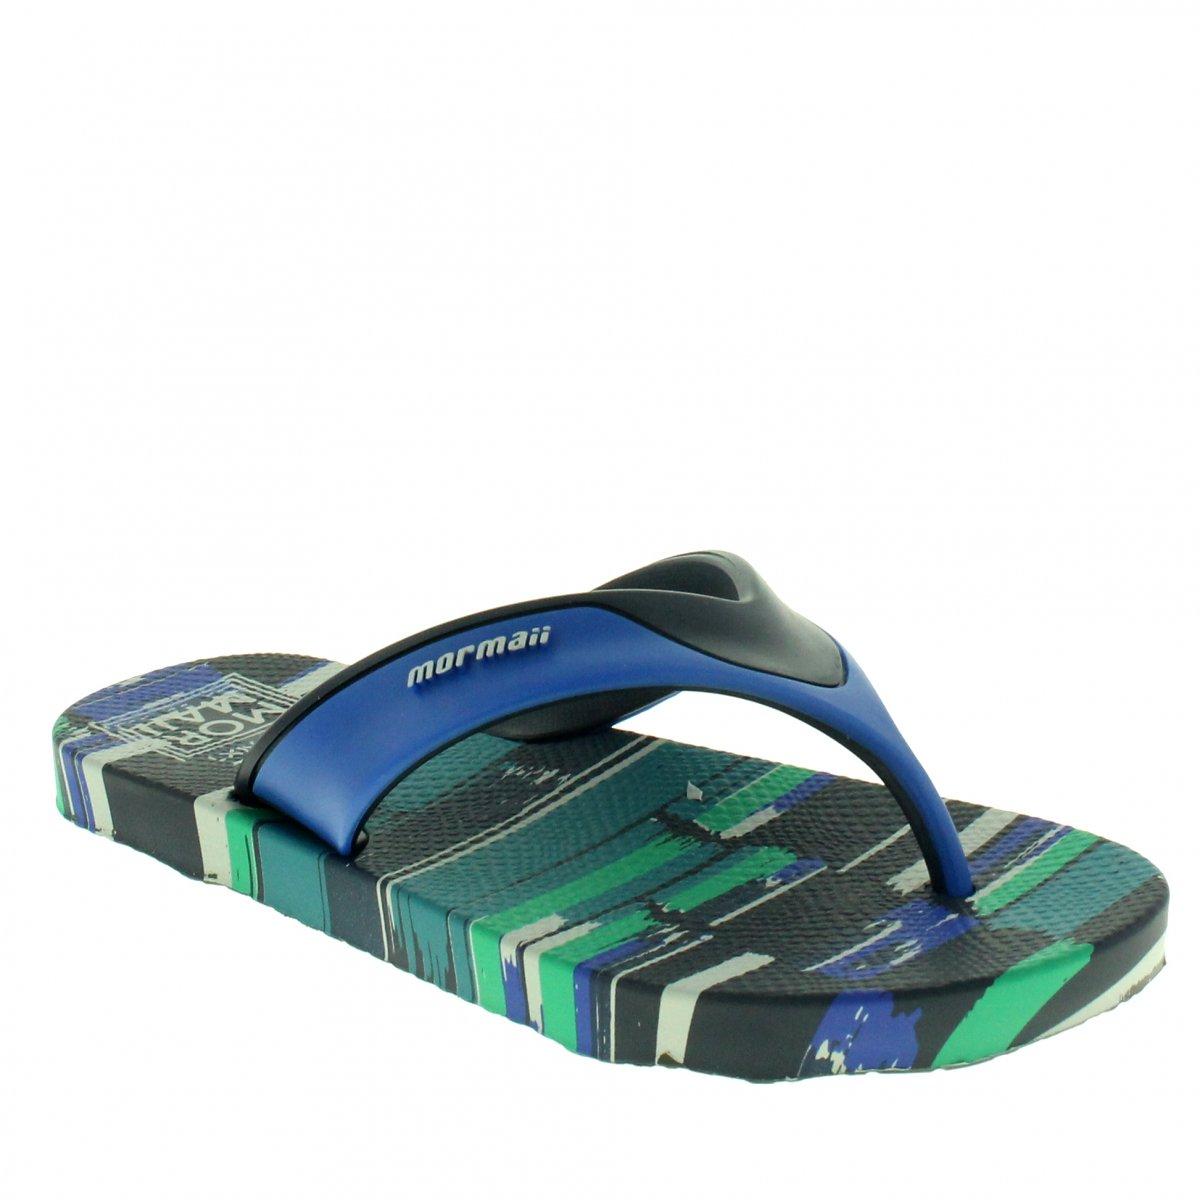 325a6403e Chinelo Mormaii Neocycle 10897   Azul/azul   Coutope